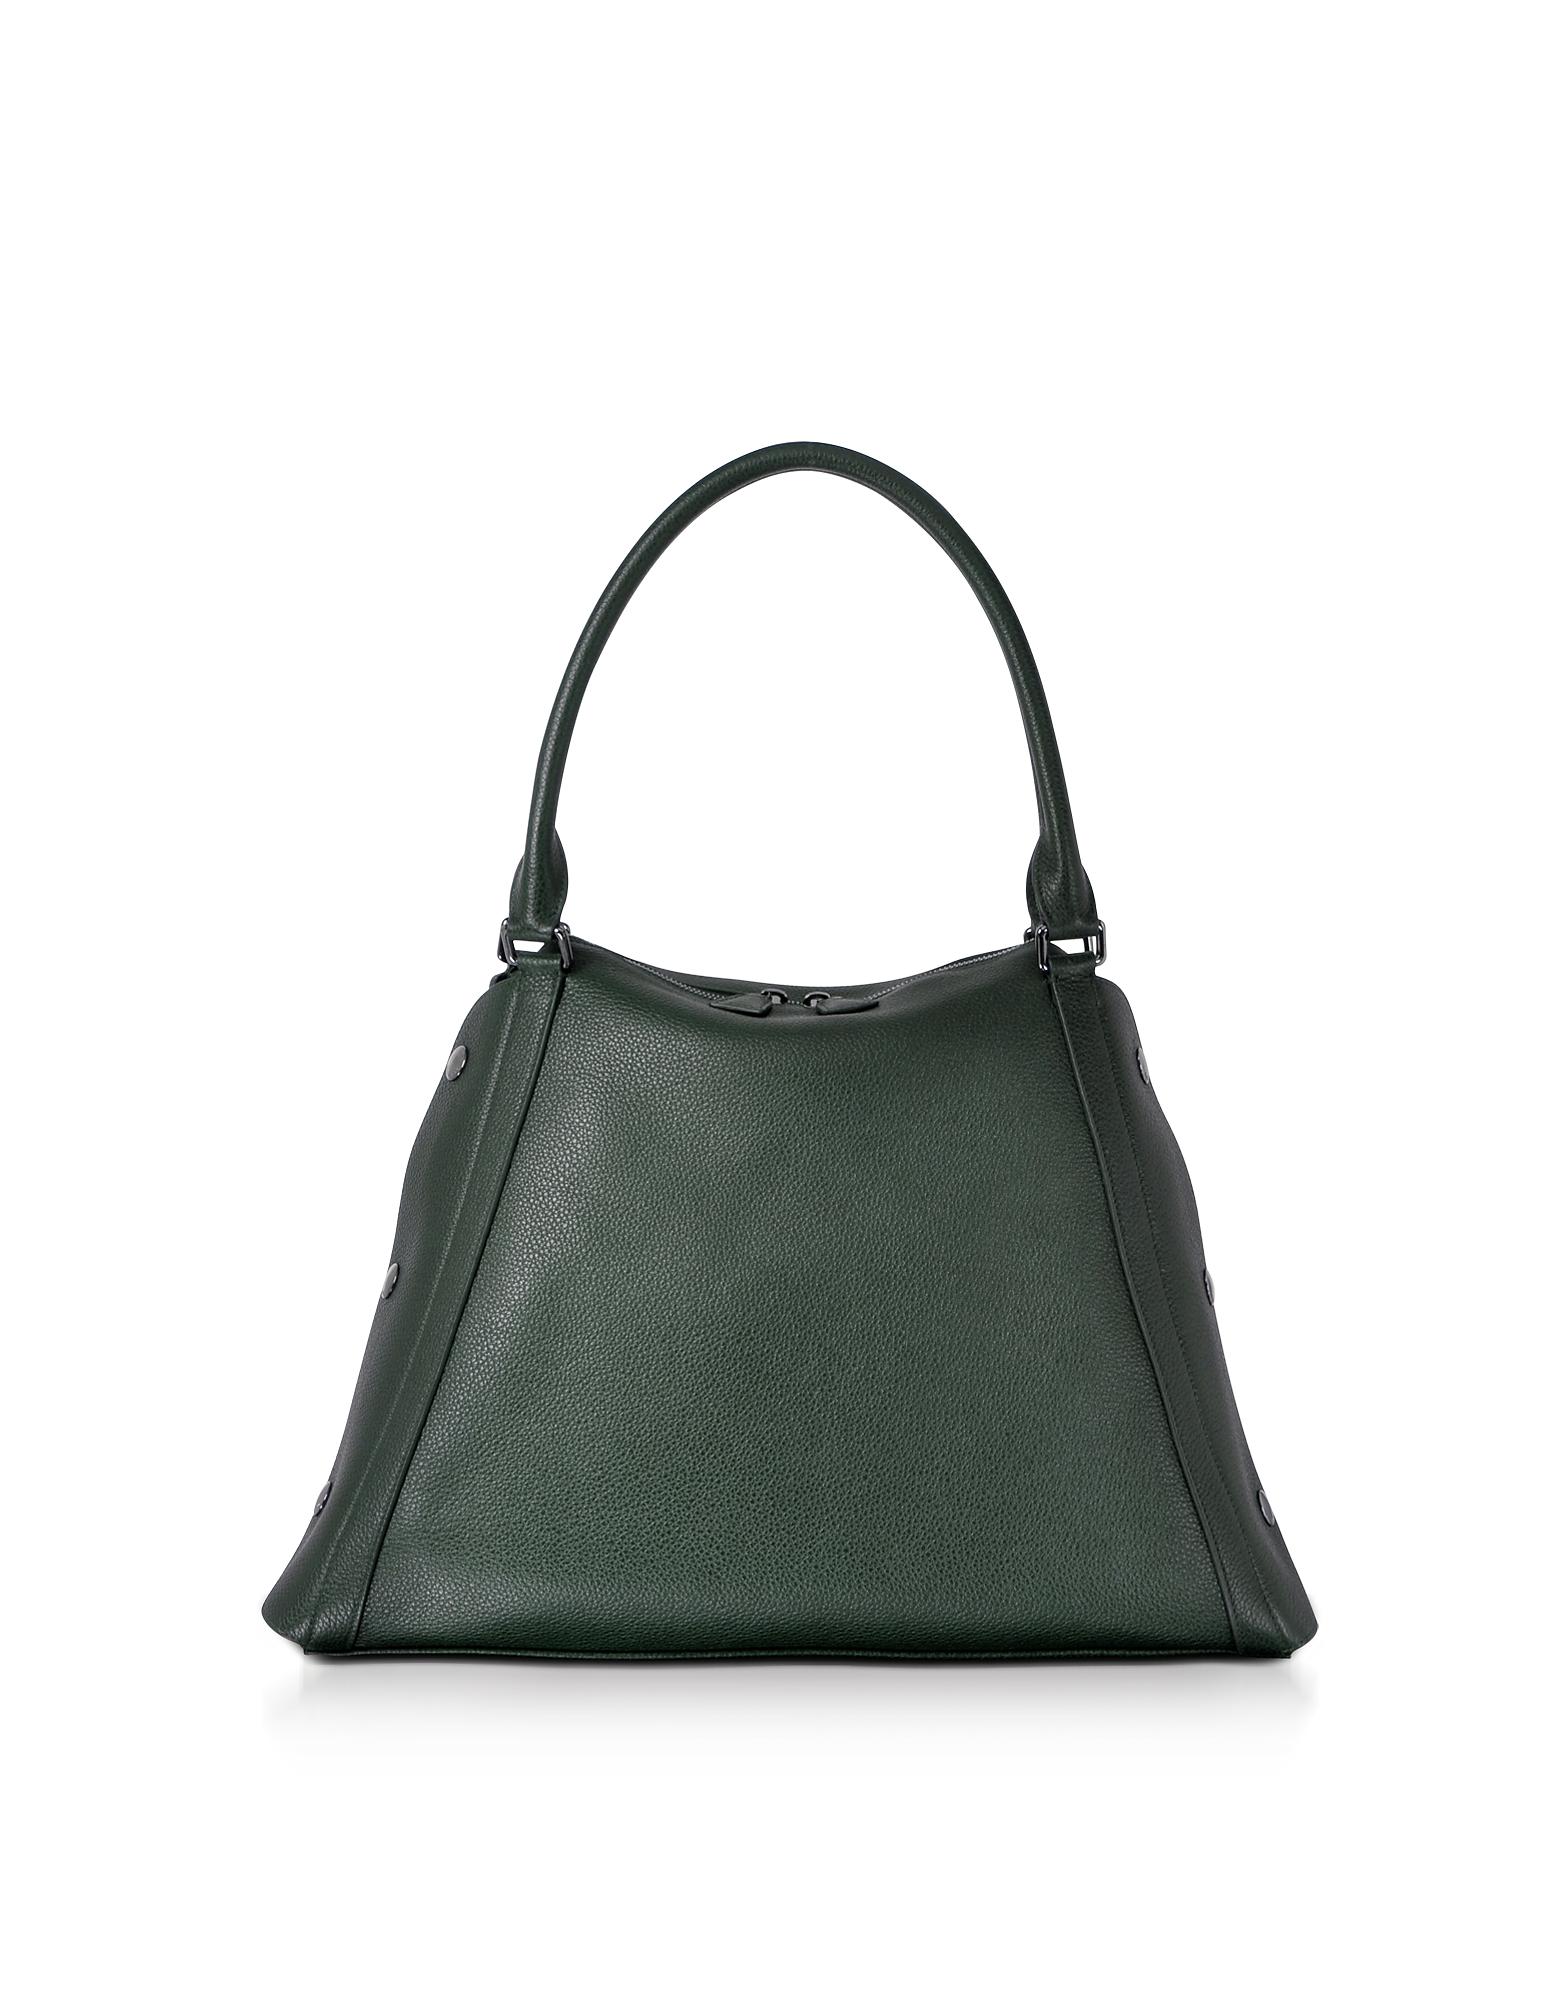 Akris Handbags, M Aimee Bottle Green Leather Satchel Bag